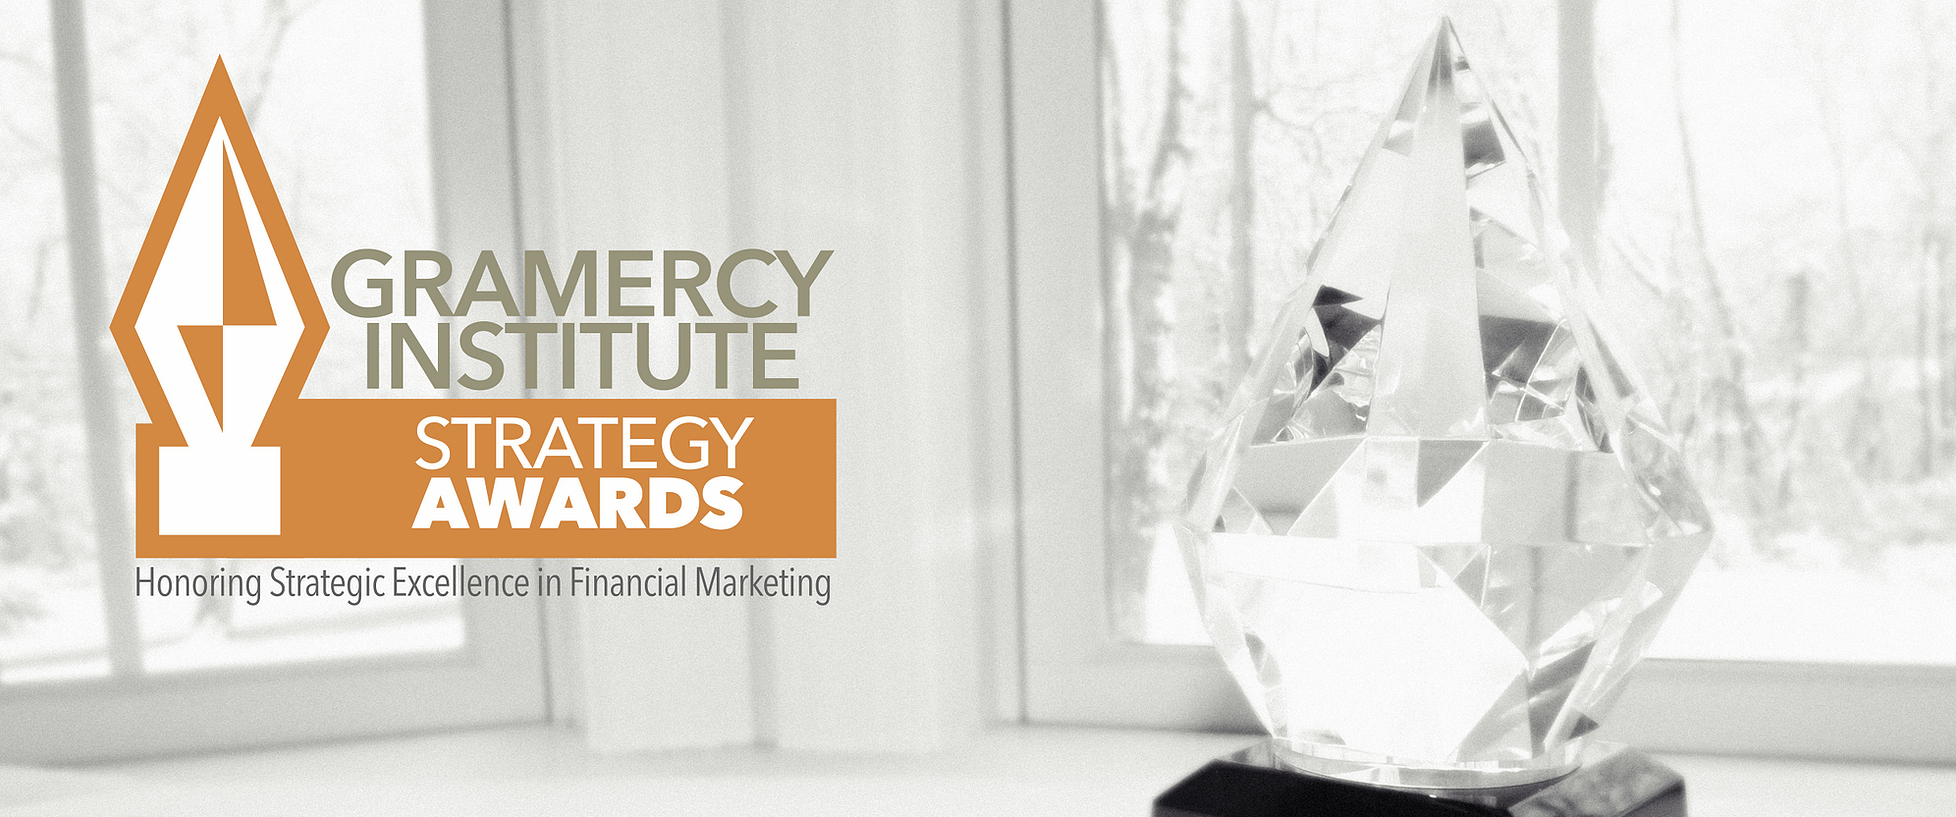 Gramercy Institute Strategy Award